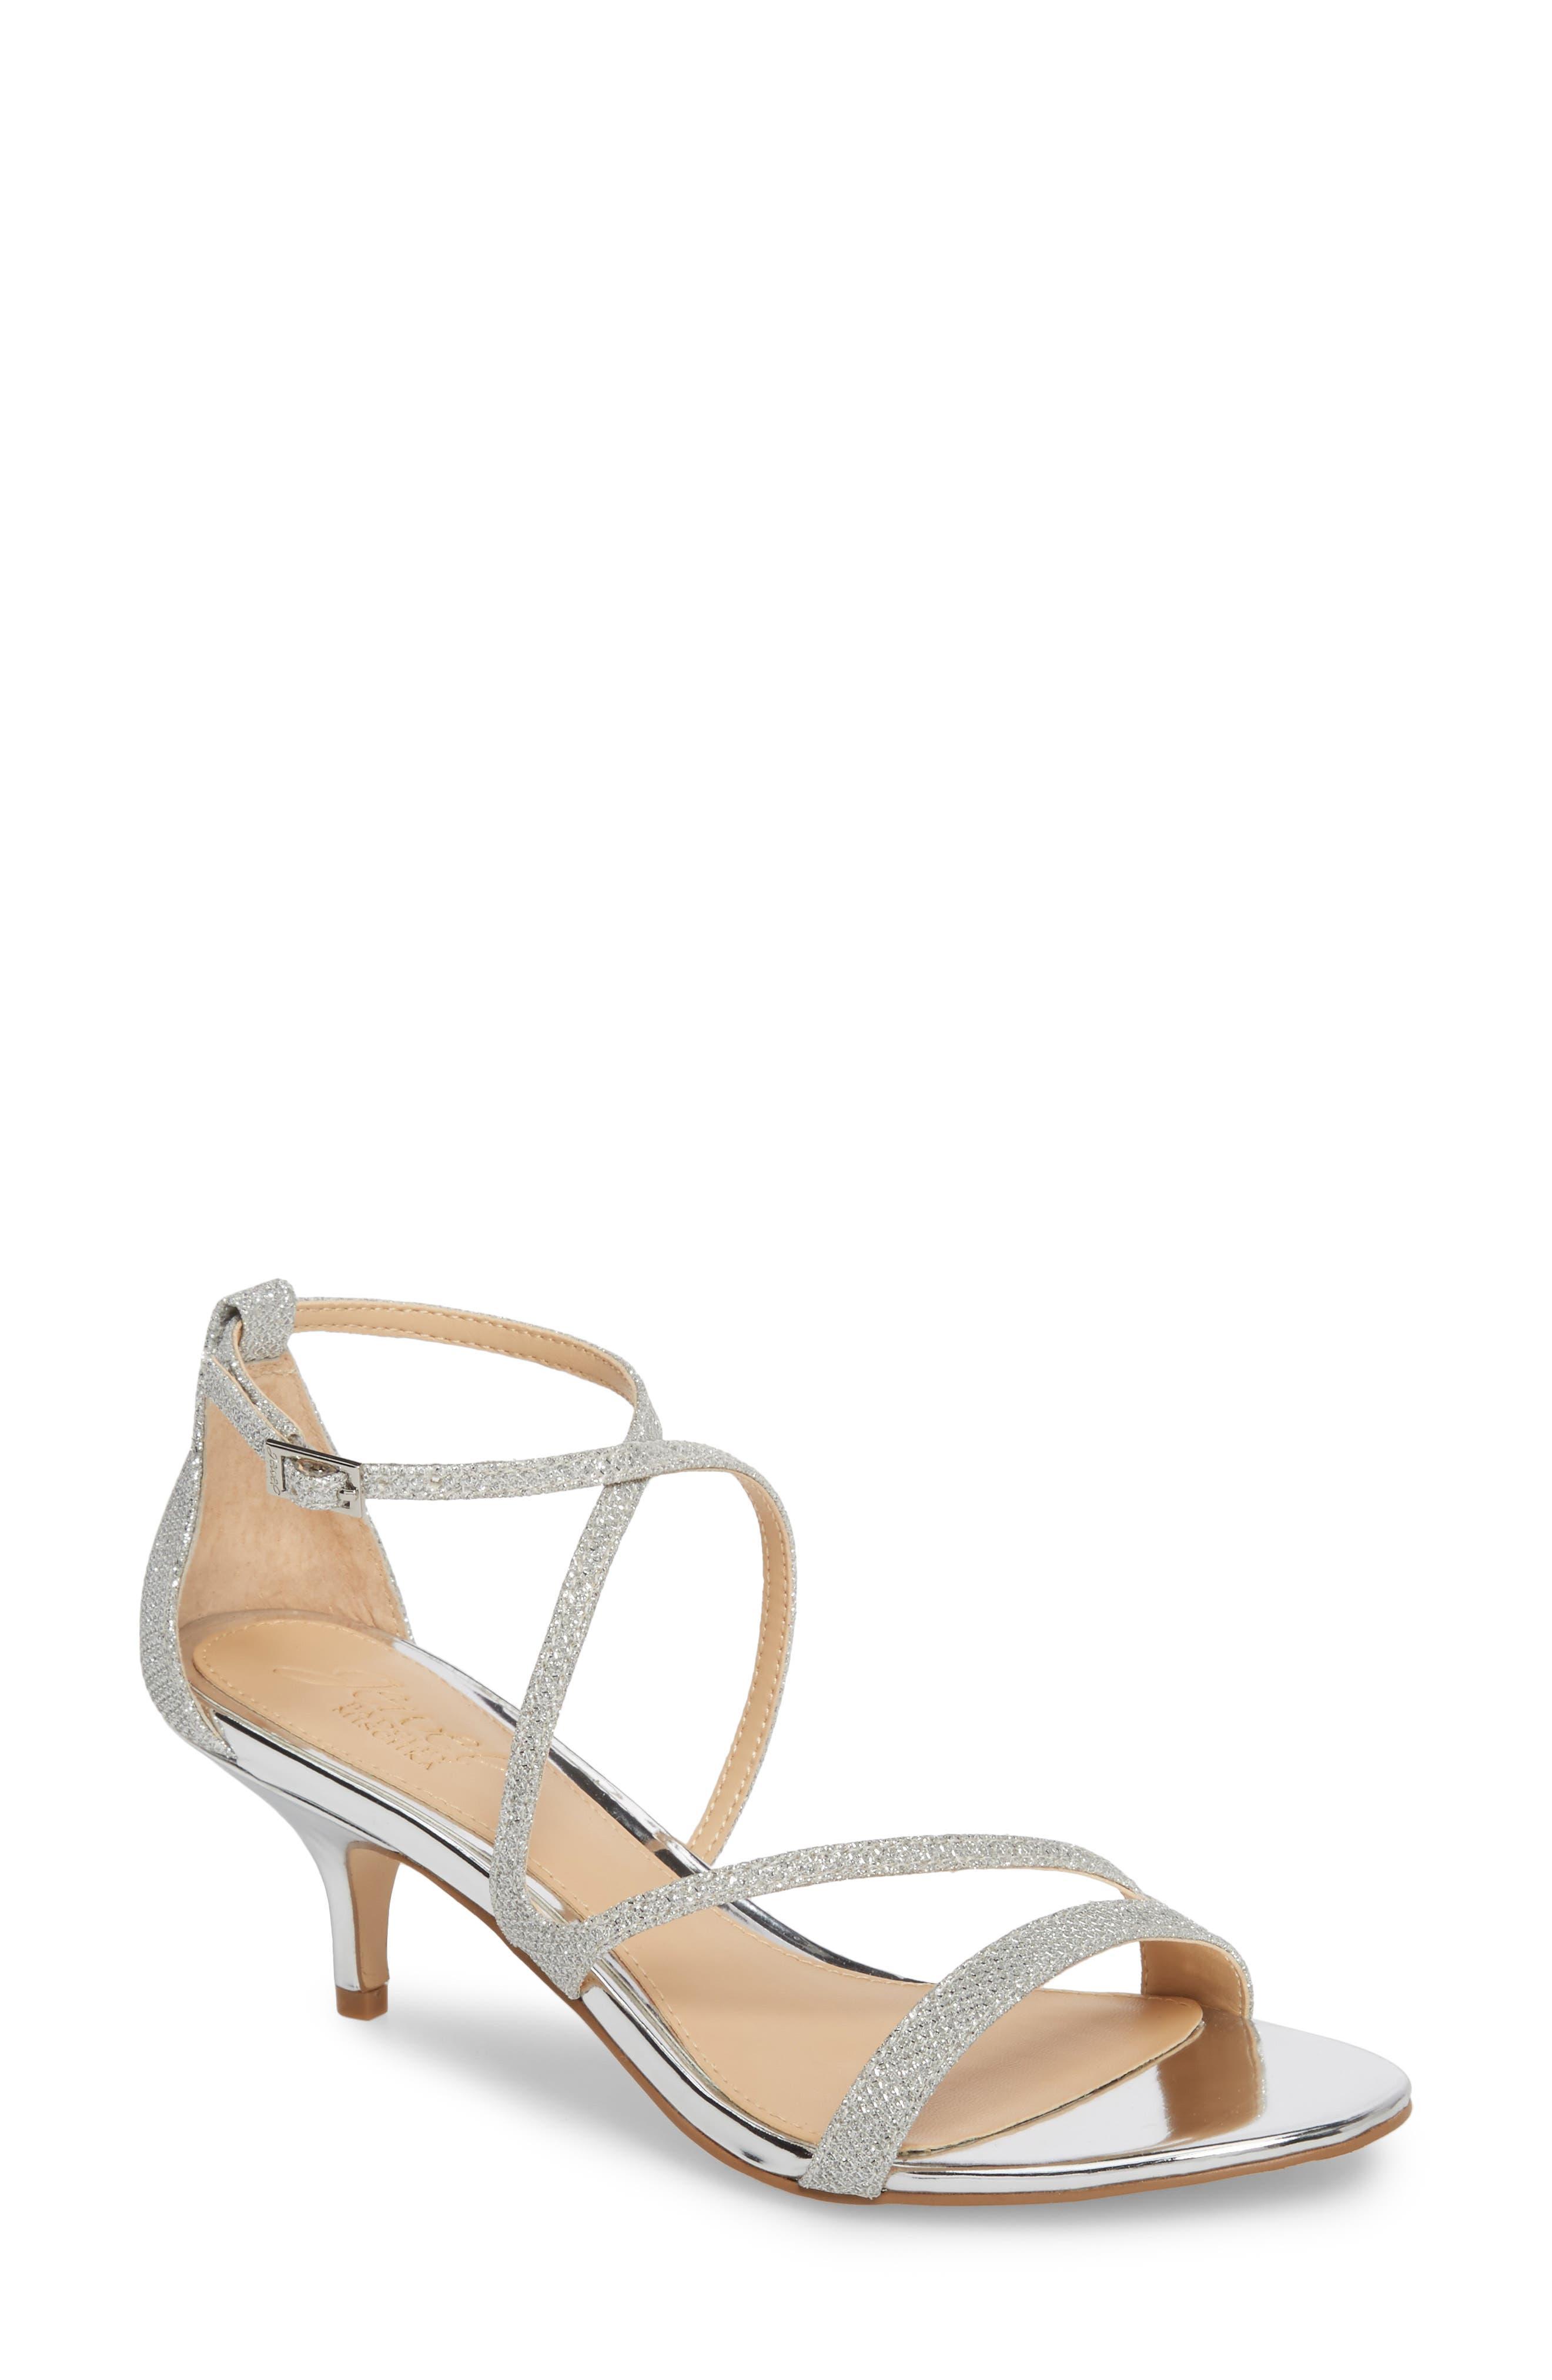 Sandals for Women On Sale, Platinum, Saffiano, 2017, 3.5 4 4.5 5 6 6.5 7.5 8.5 Prada